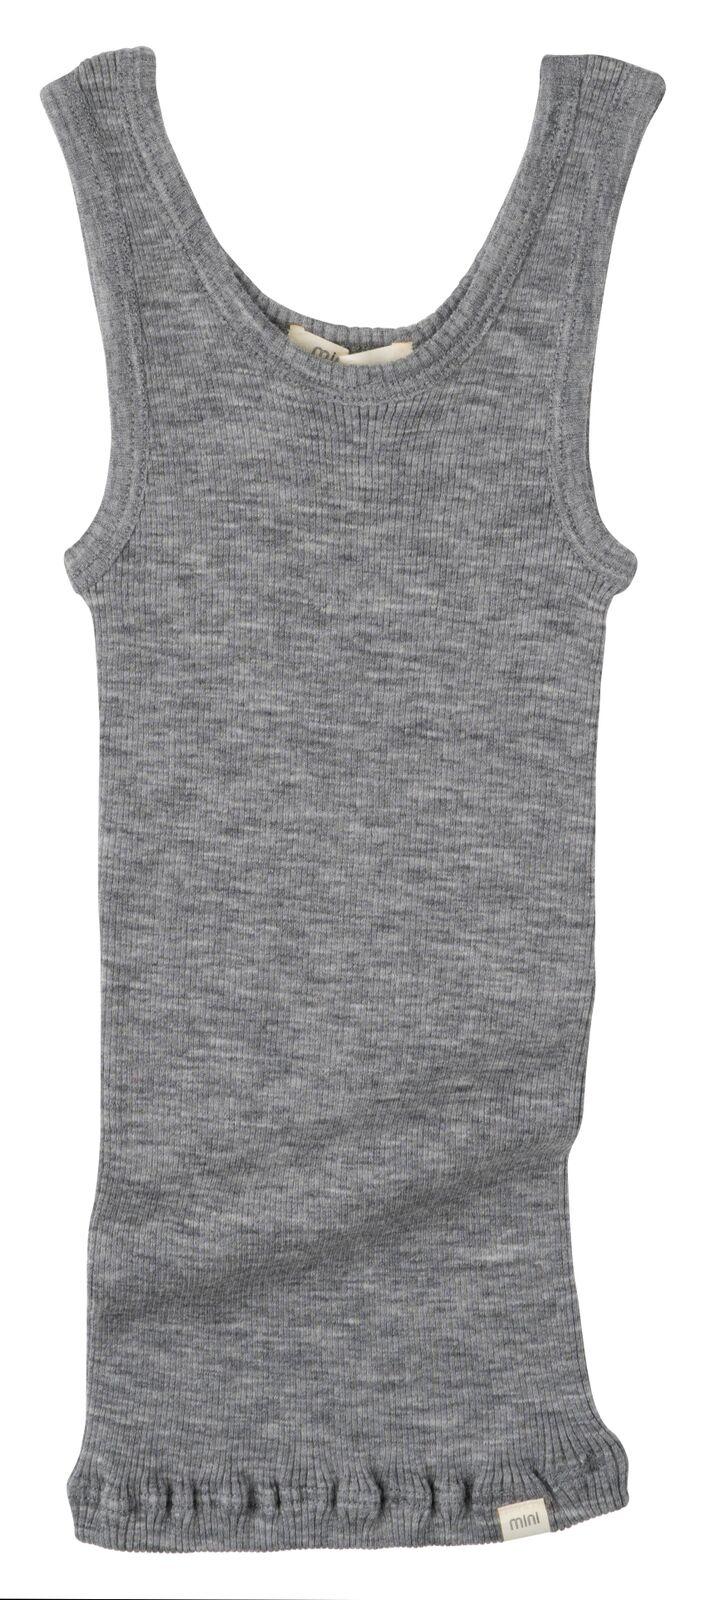 Minimalisma ARENDAL tanktop wool - fine rib - 100% merino - grey melange - 2y to 12y